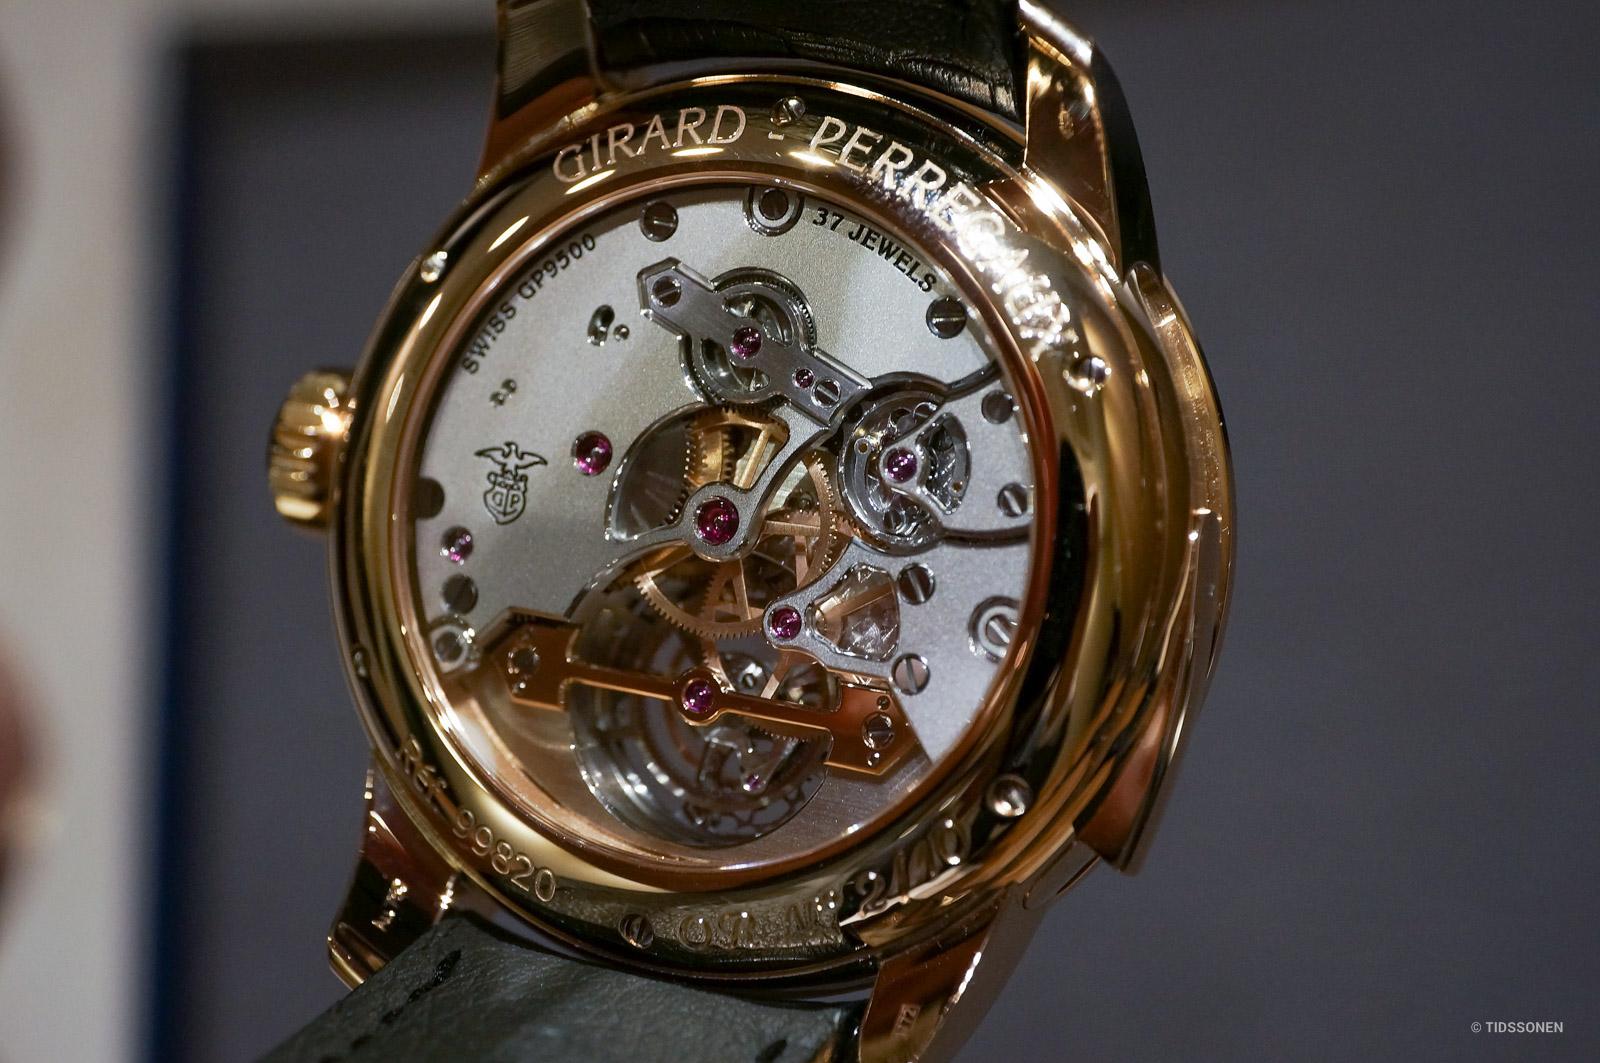 girard-perregaux-tourbillon-minute-repeater-gold-bridges-1